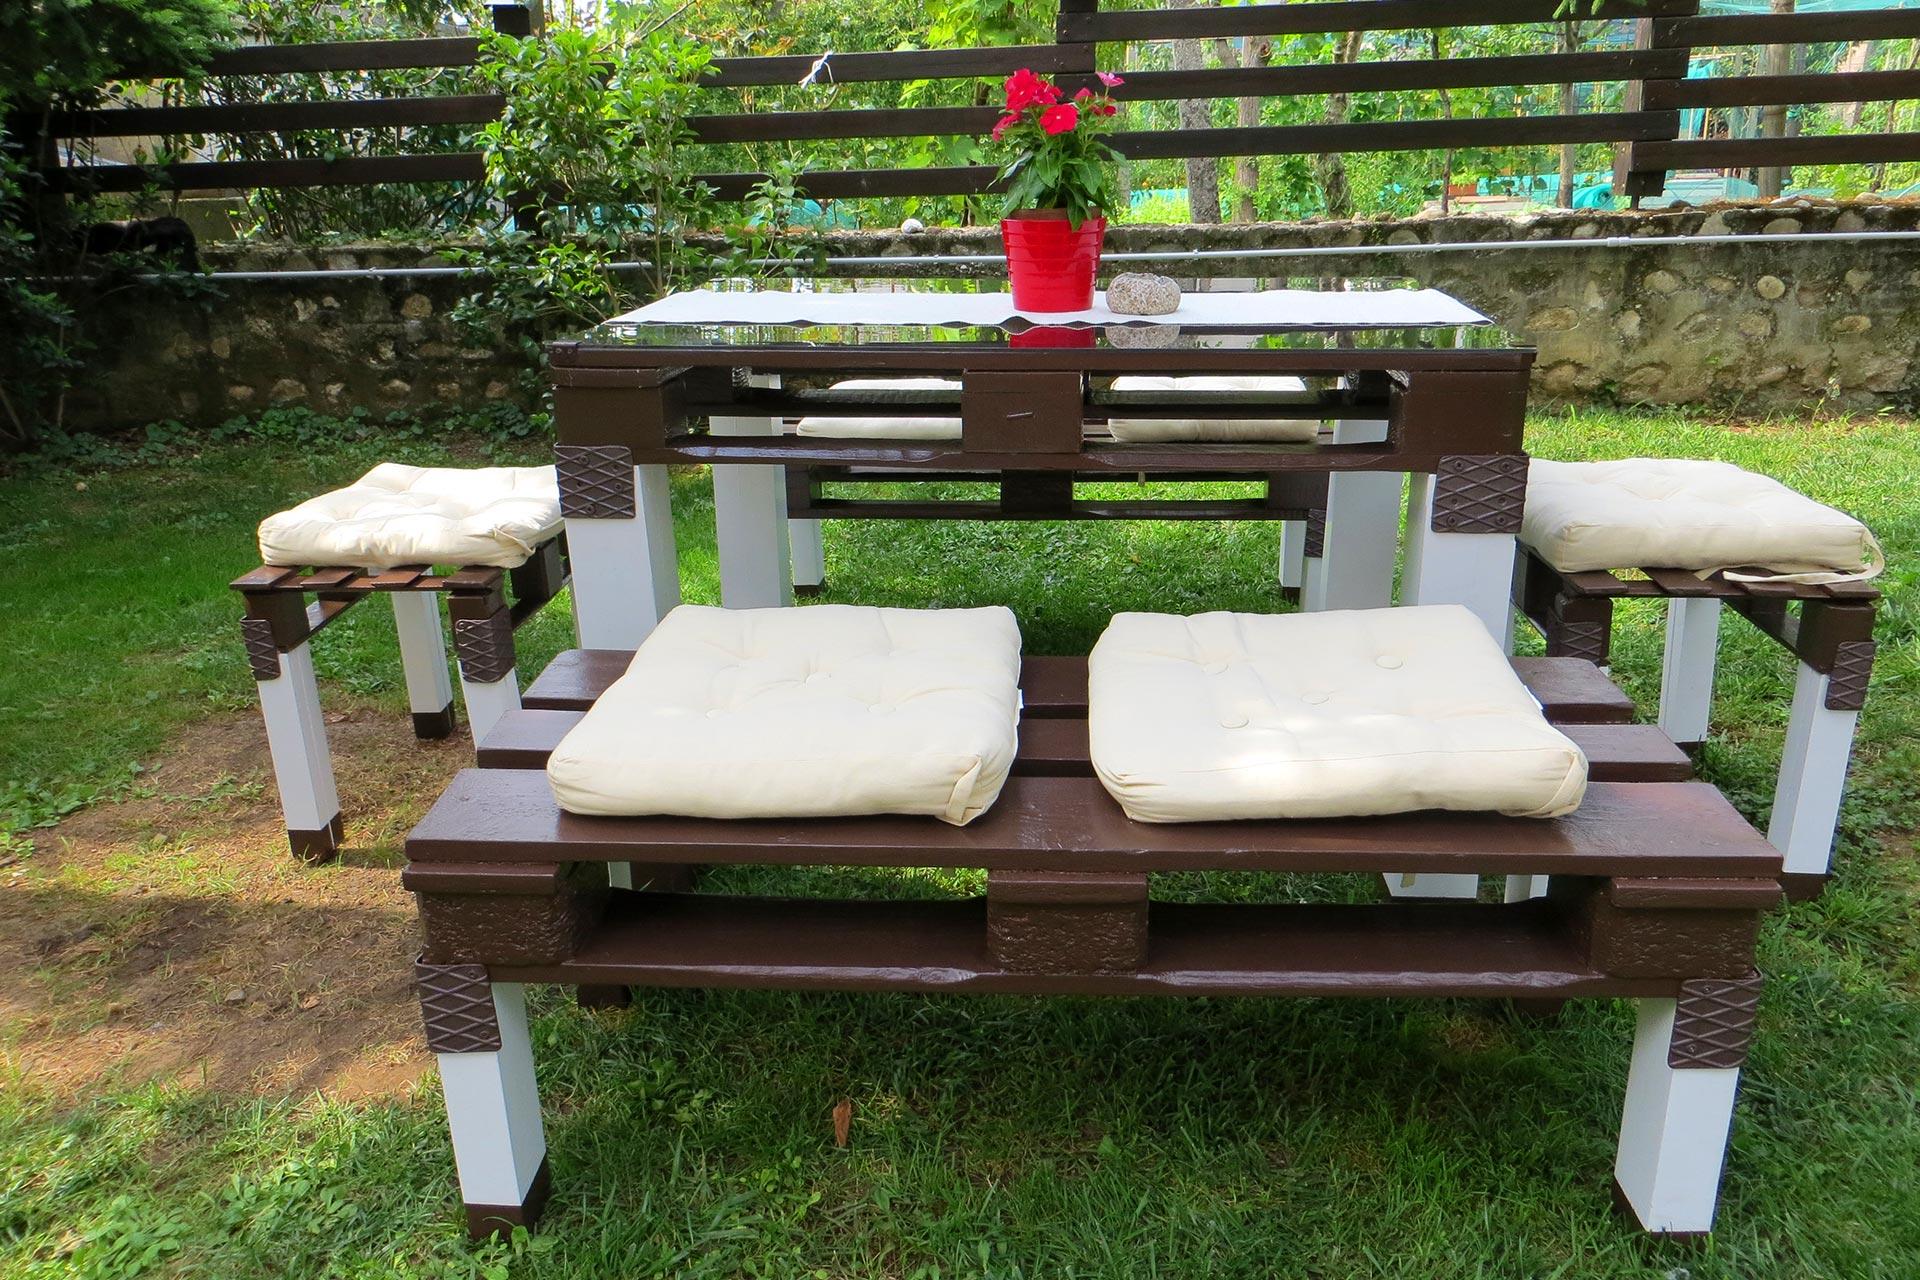 Tavolo e panche mikkom - Tavolo e panche da giardino ...